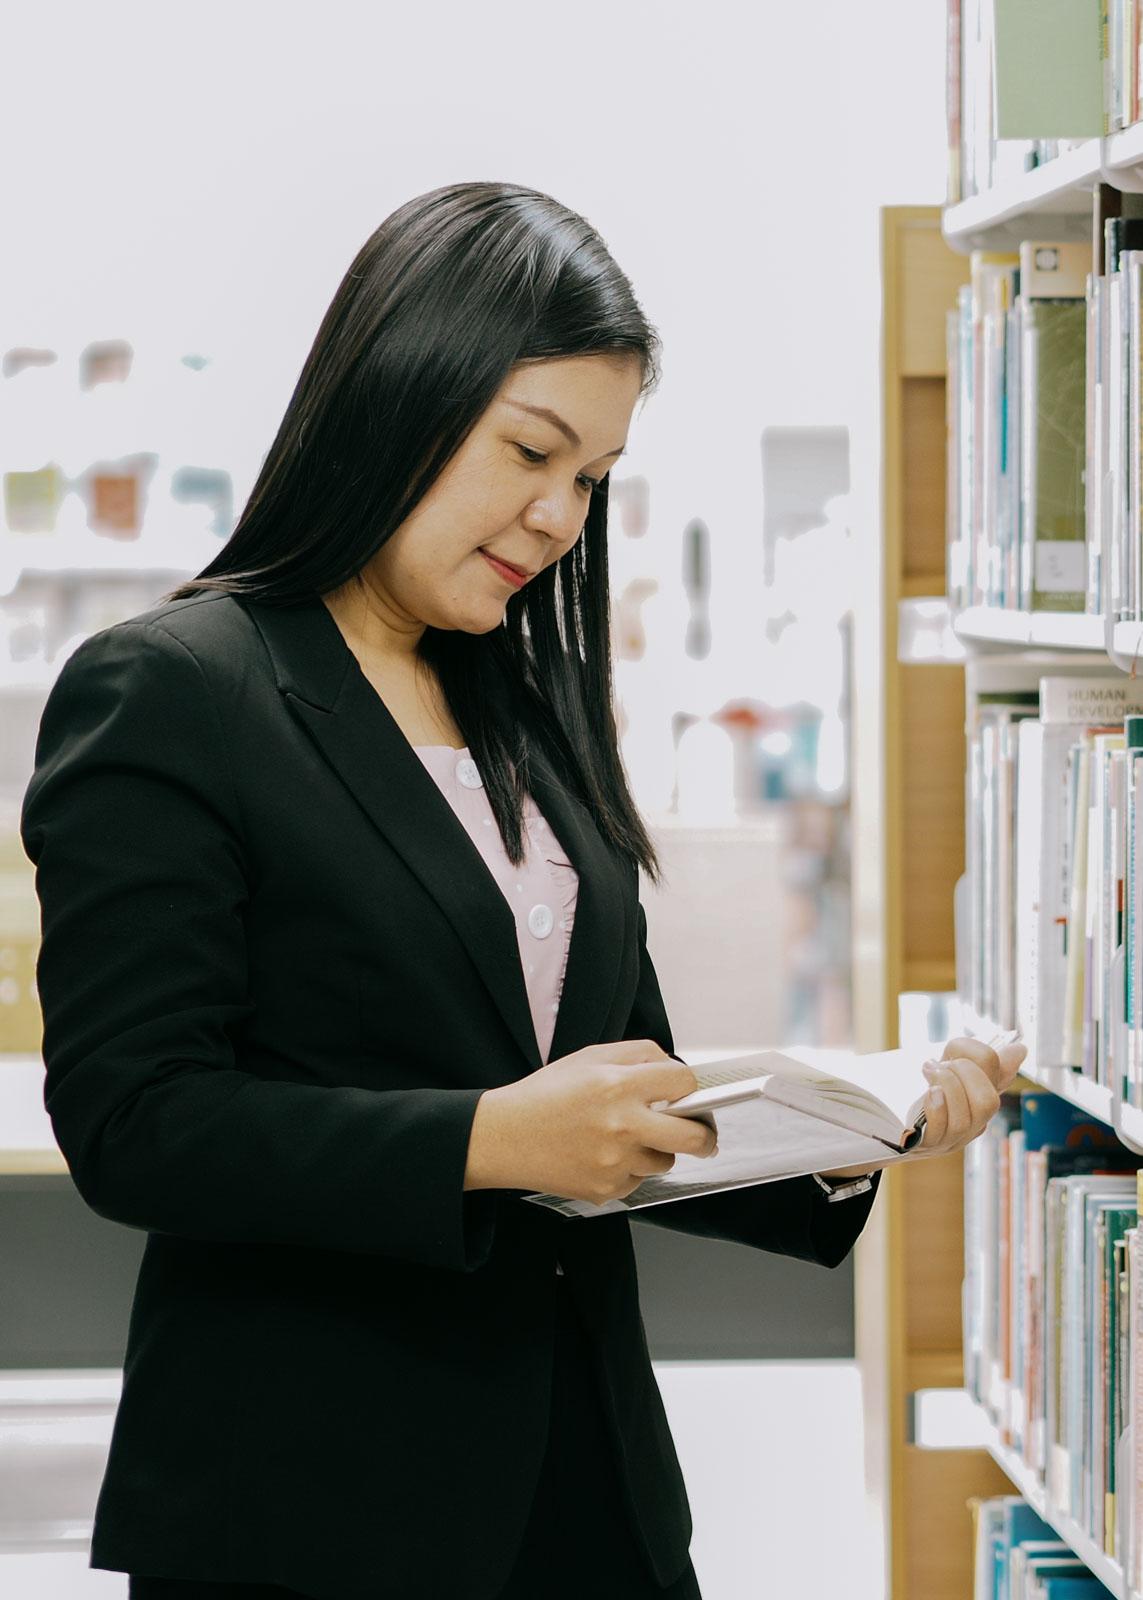 Image-of-ห้องสมุดสถาบันพระปกเกล้า